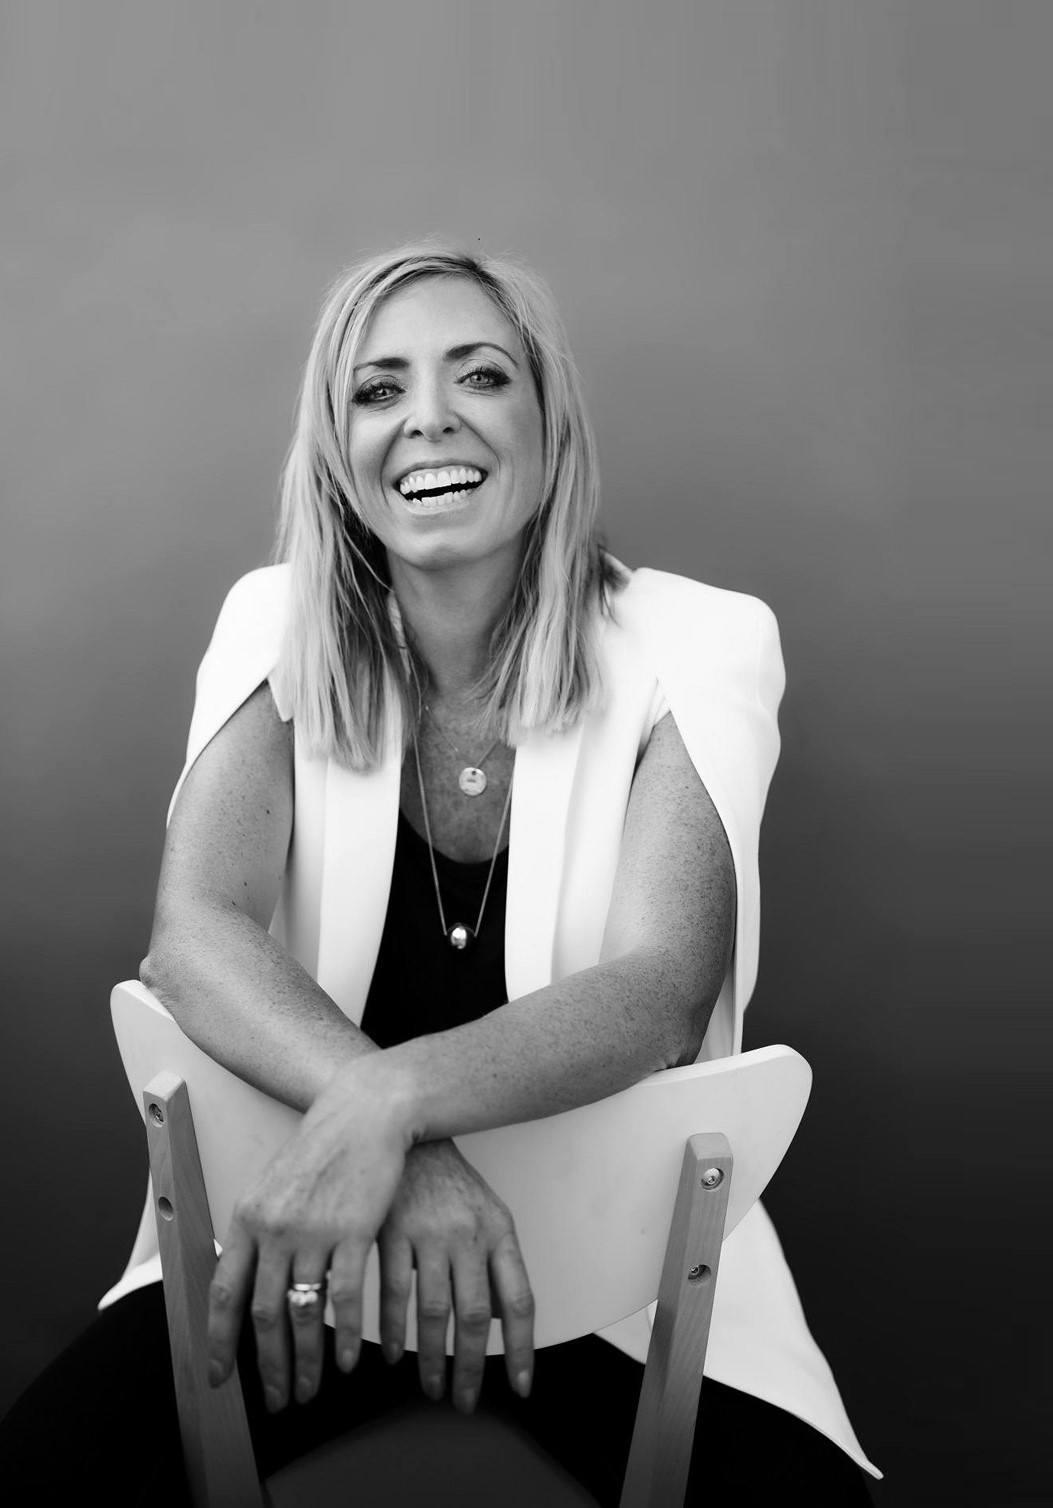 Portrait photo of smiling Janine Garner